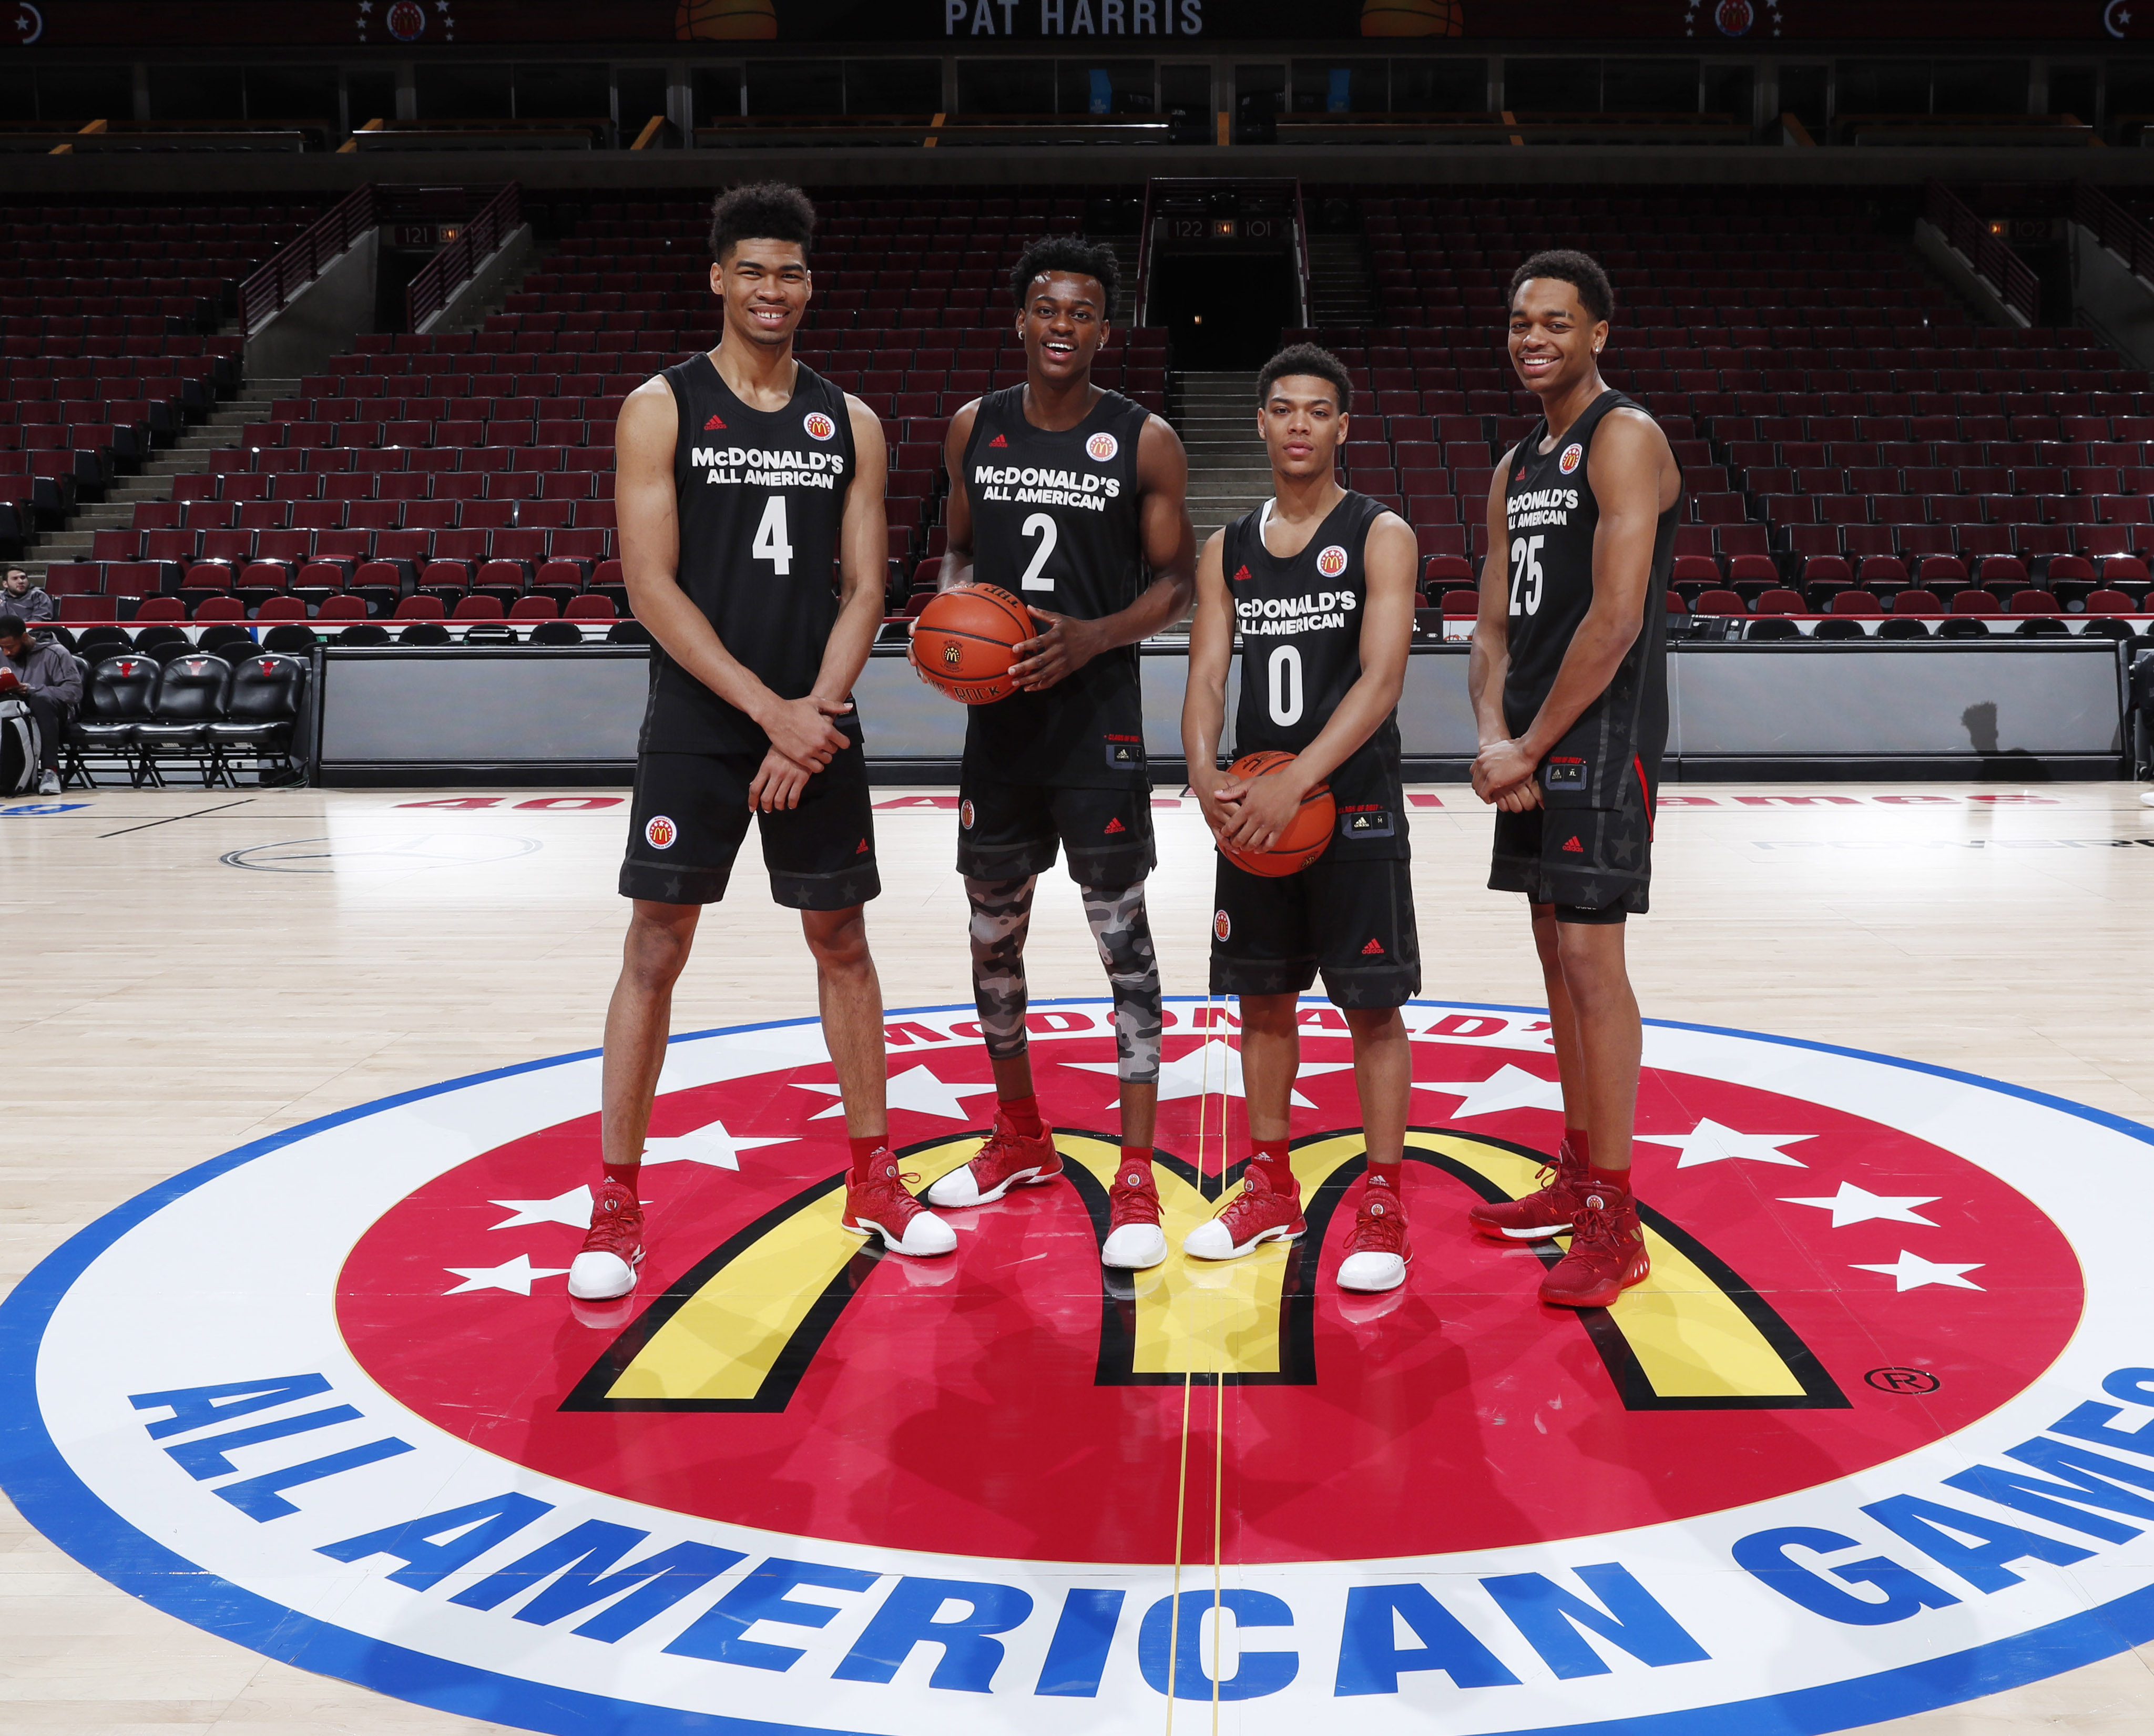 High School Basketball: 40th Annual McDonald's All-American Games